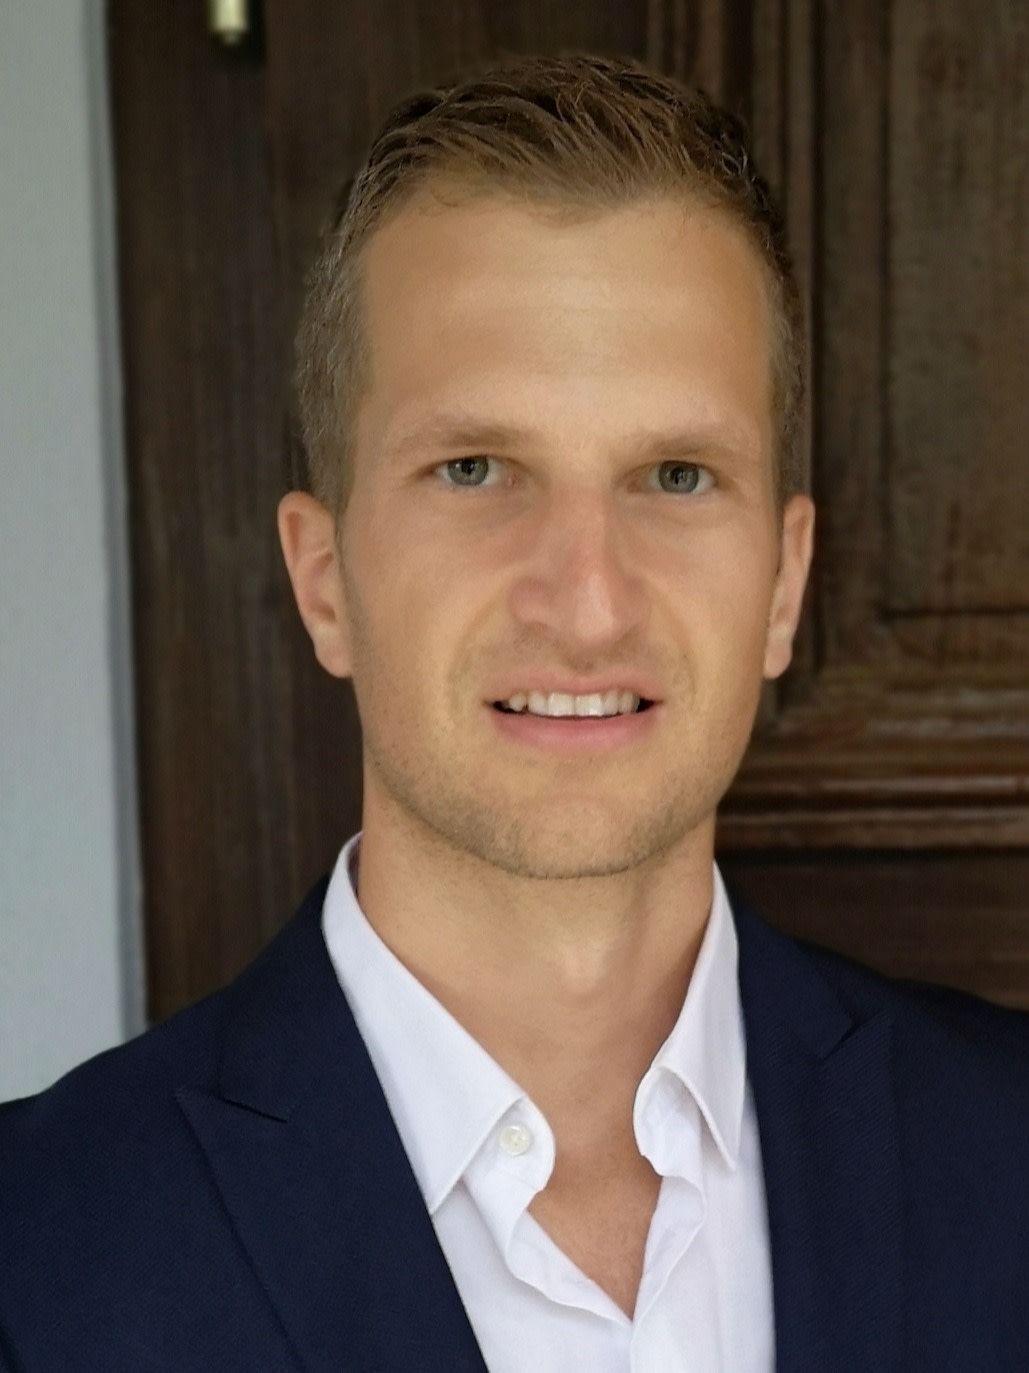 Bitcoin Association names Patrick Prinz as Europe & Operations Manager, Bitcoin Association